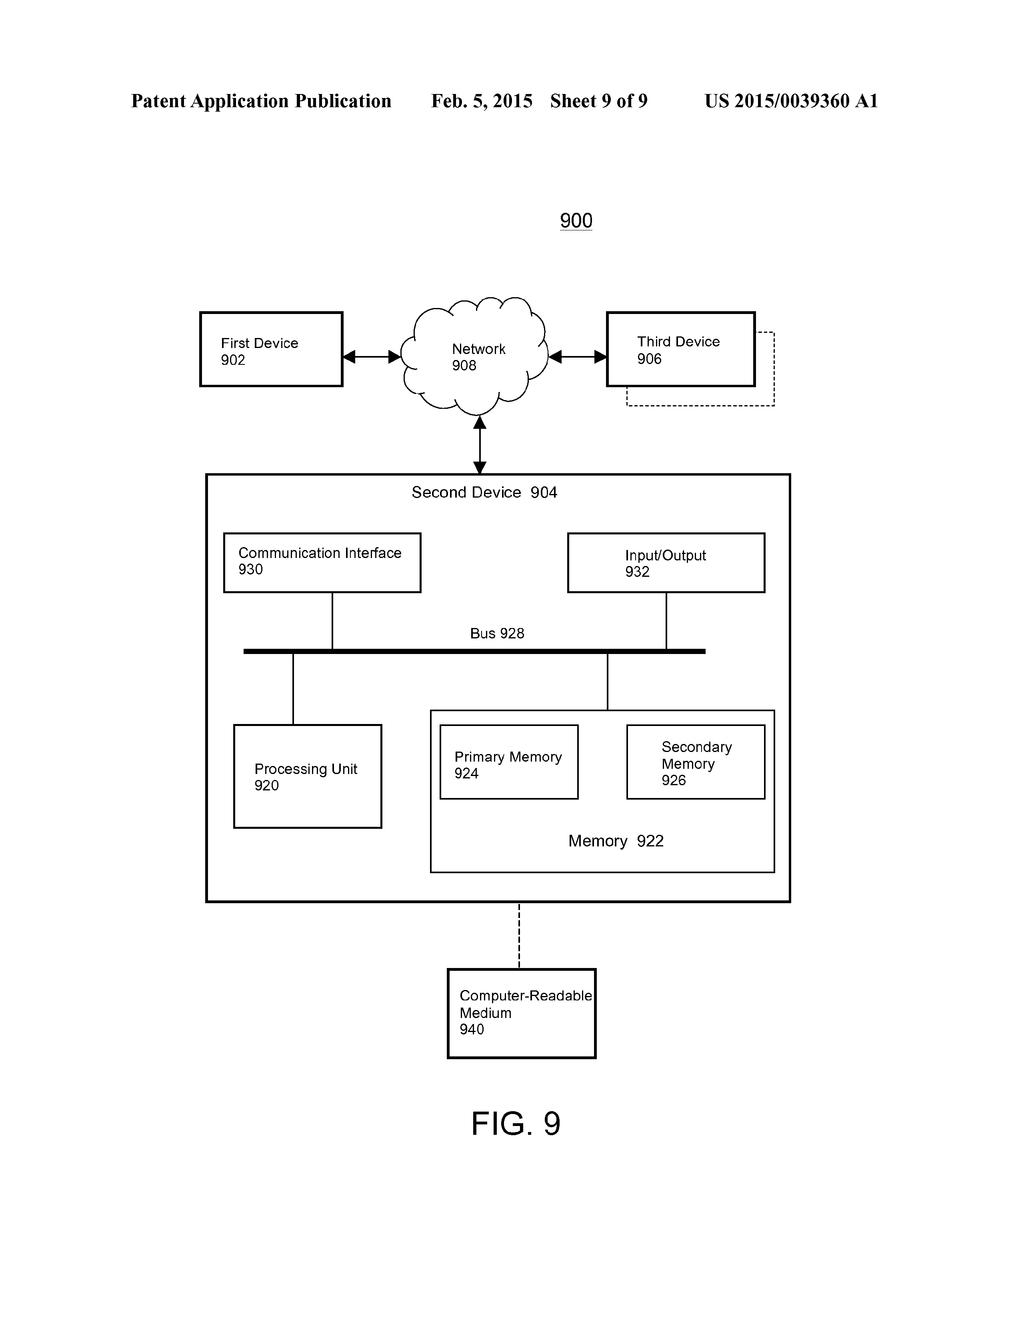 20150039360_10 dependency management for enterprise computing diagram, schematic